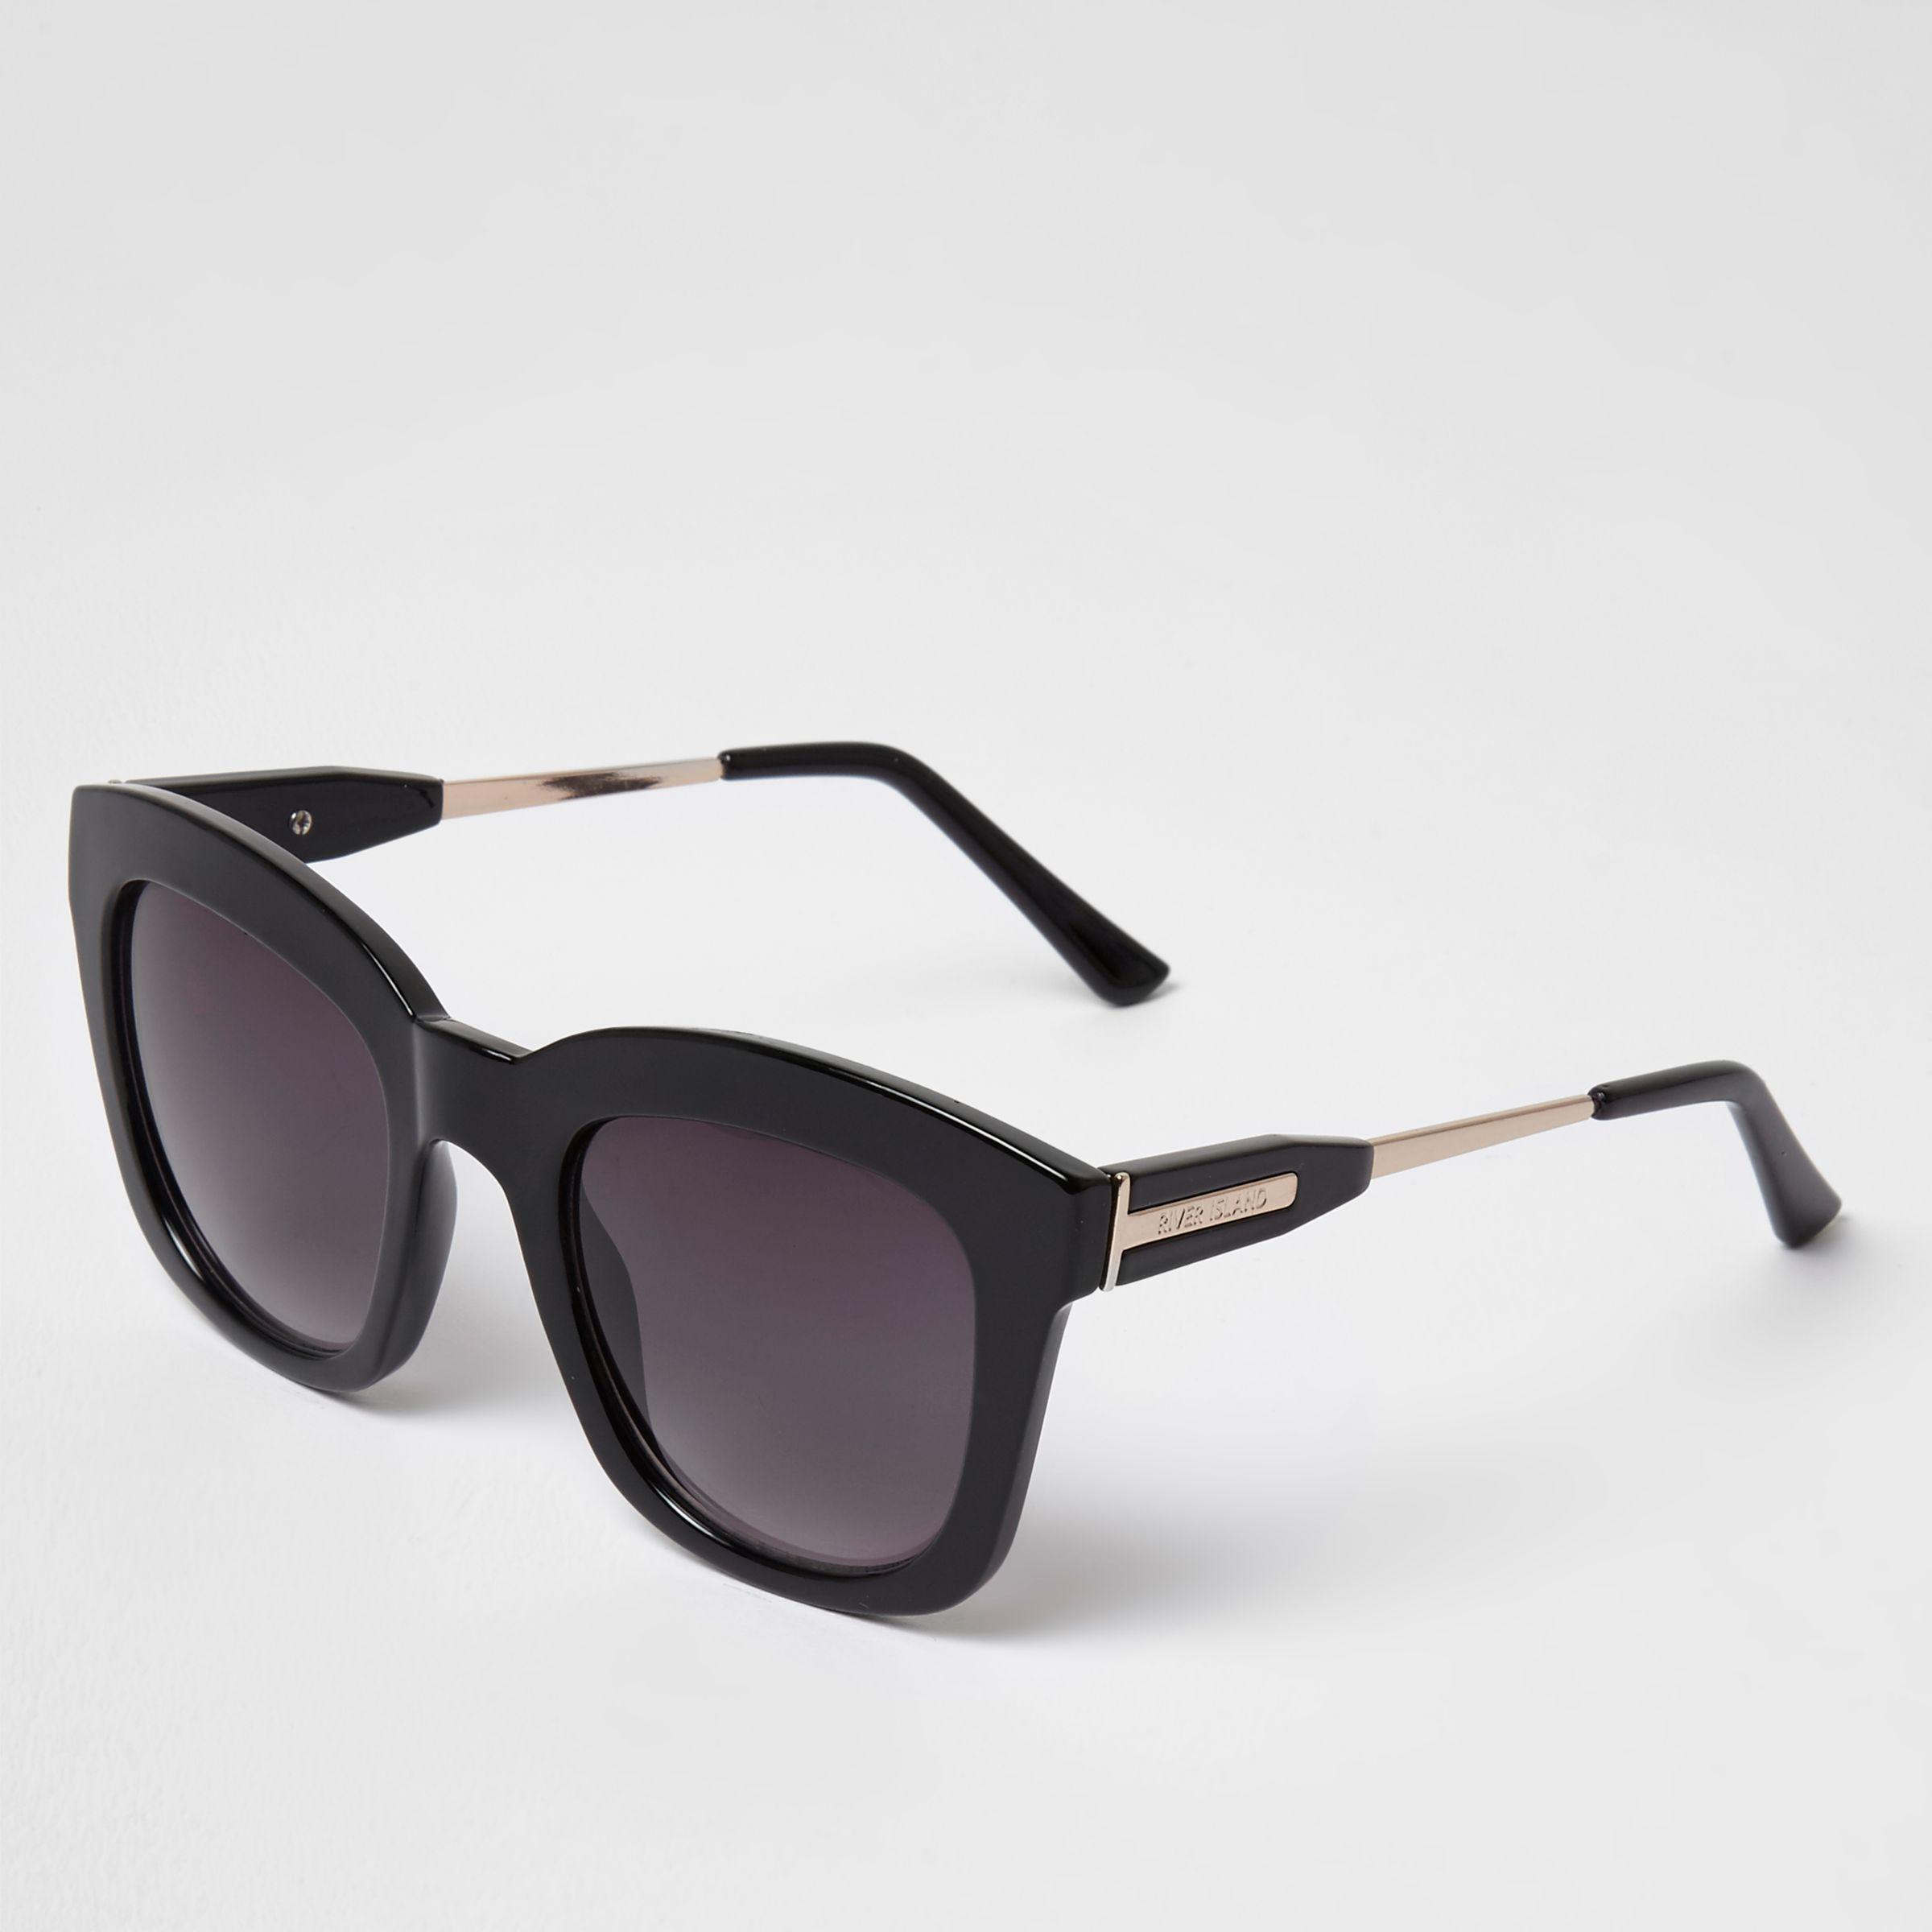 Lyst - River Island Oversized Glam Smoke Lens Sunglasses in Black 96d8843671